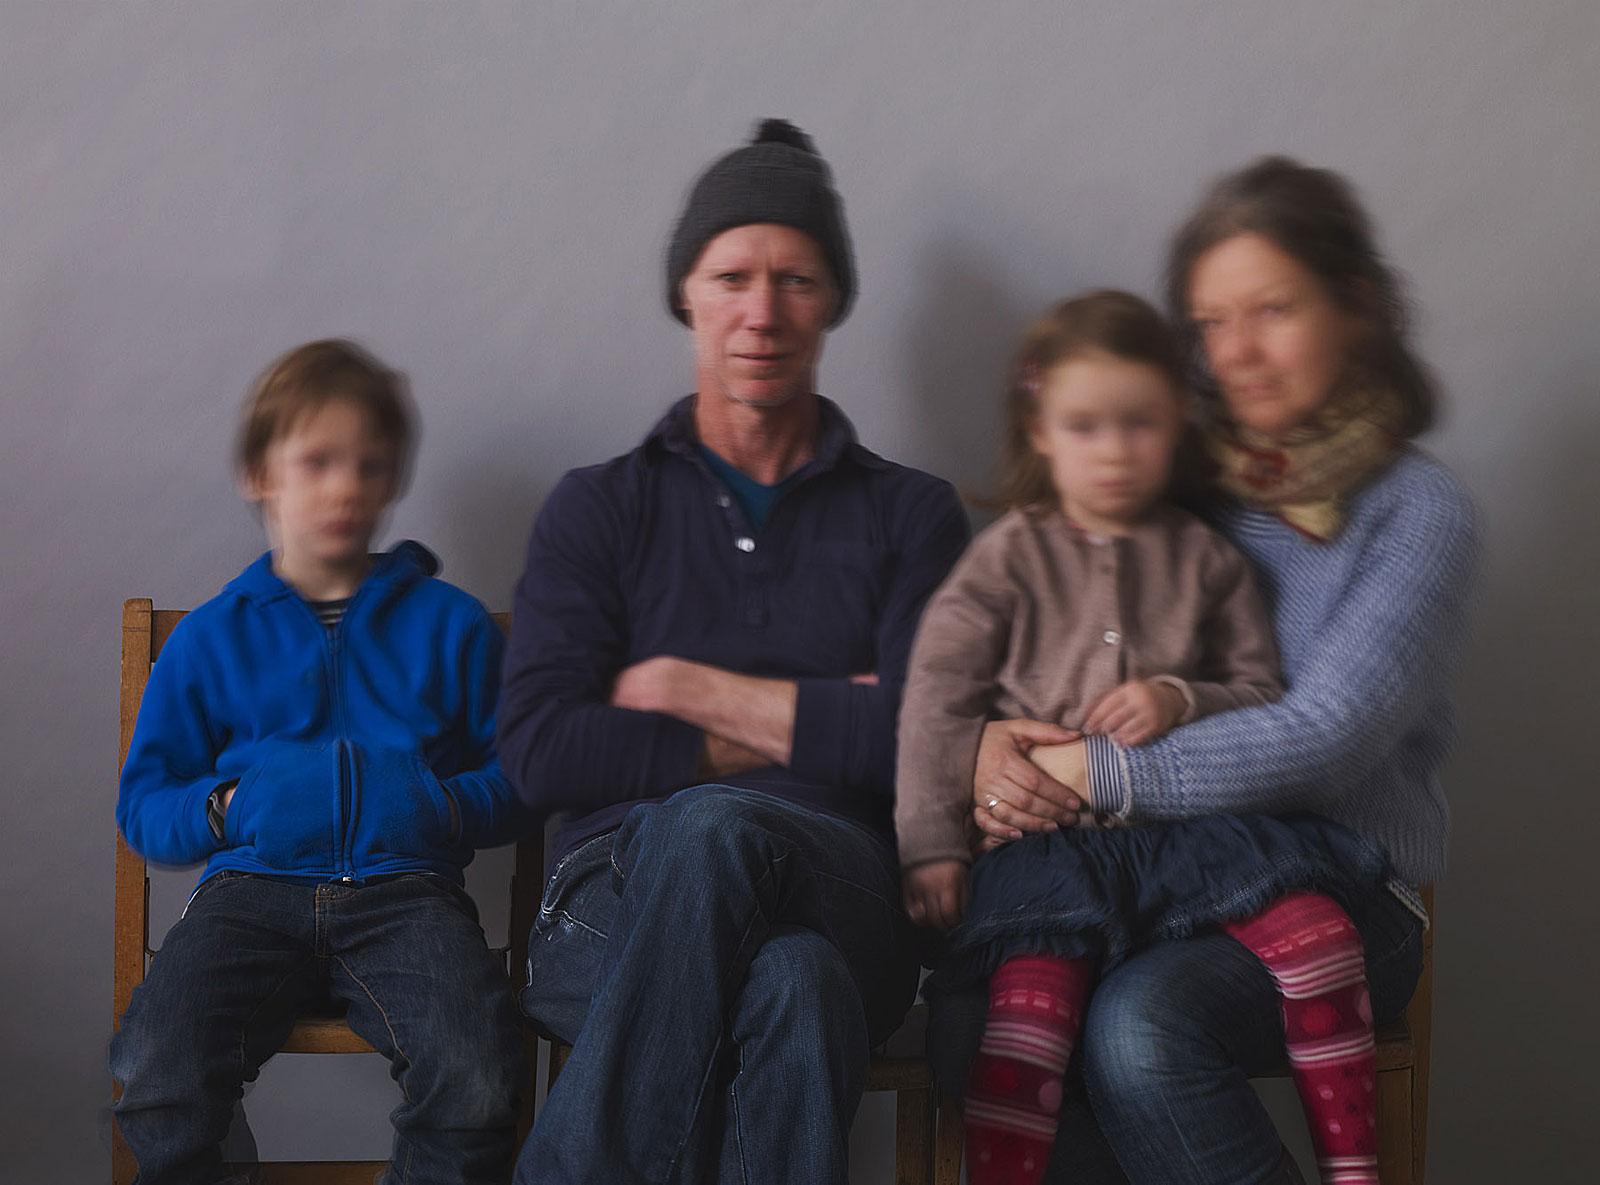 Oscar, Charles, Nico and Lucinda (16.46 - 16.51 Uhr, 11.2.2012)